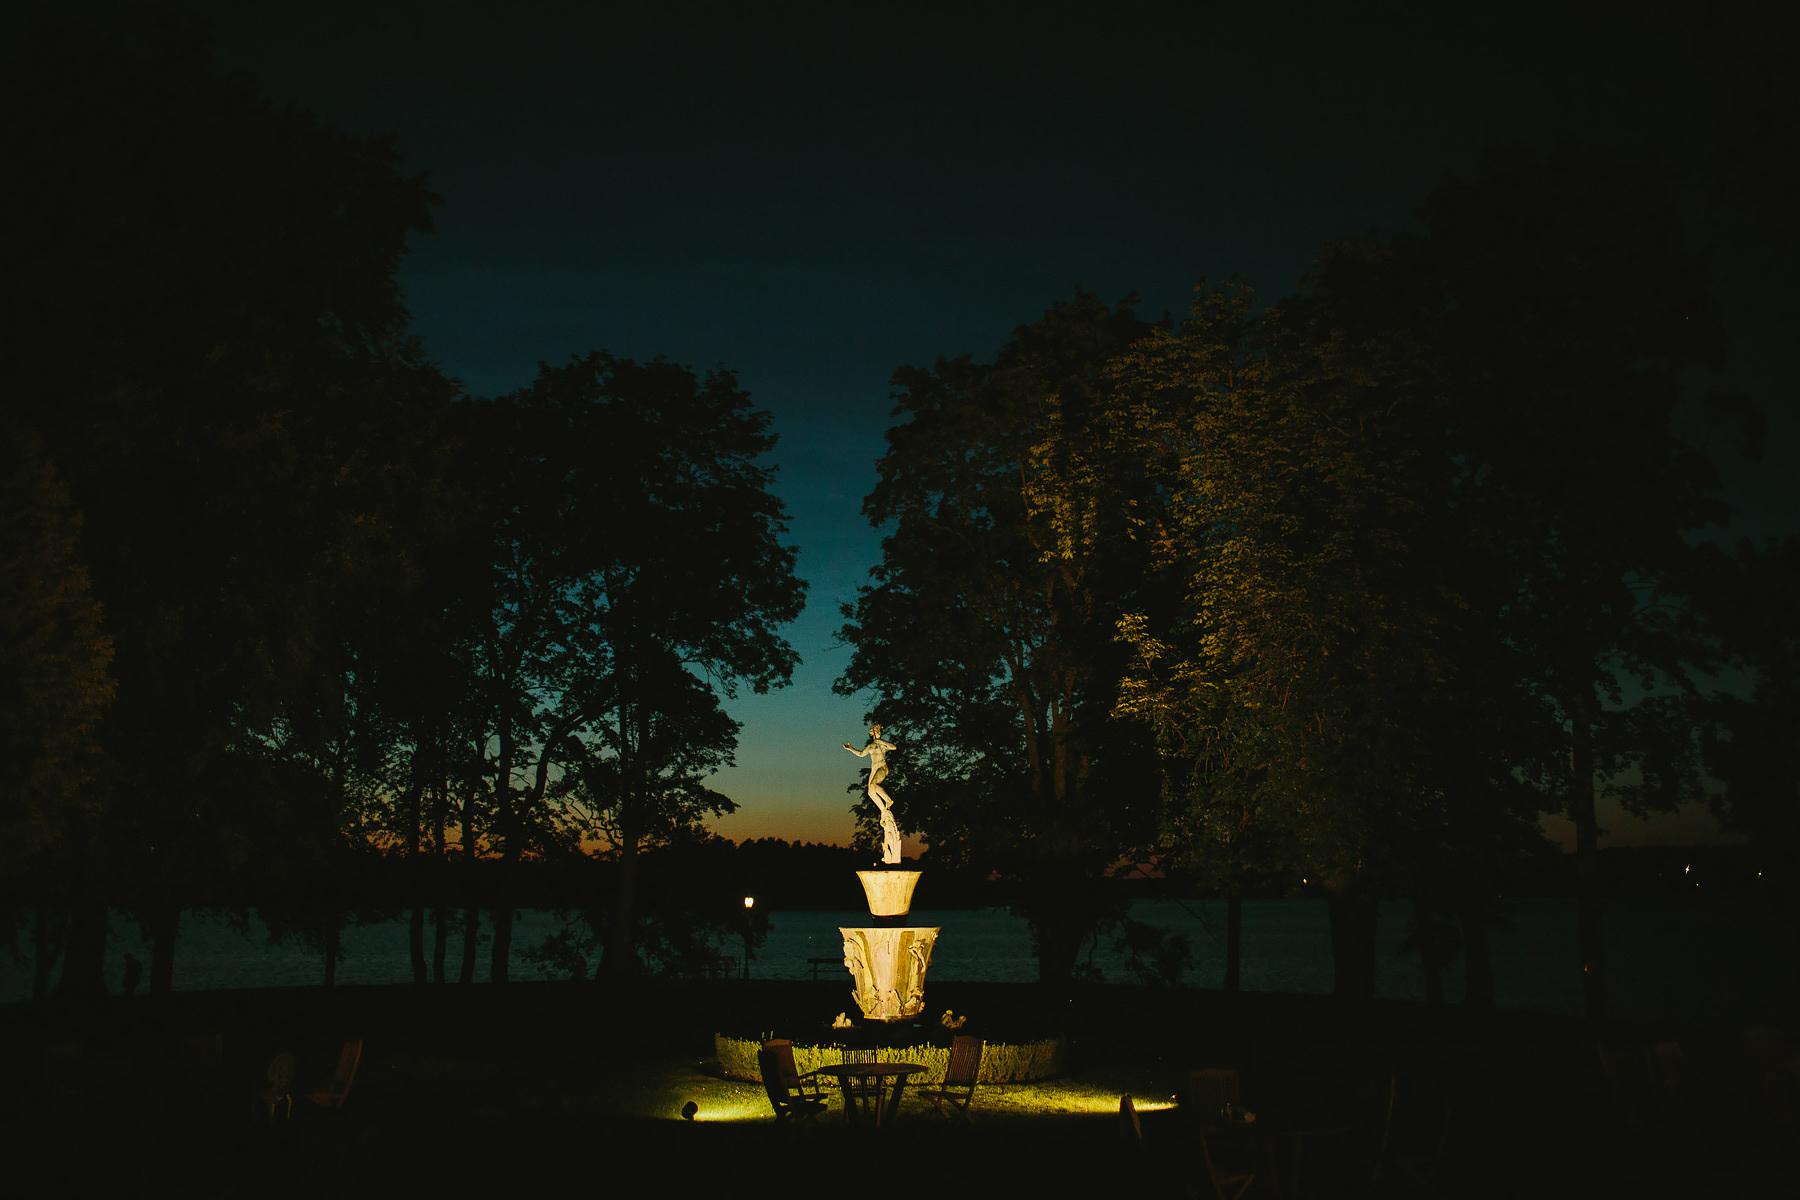 Solnedgång med Carl Milles staty Skytteholm Ekerö